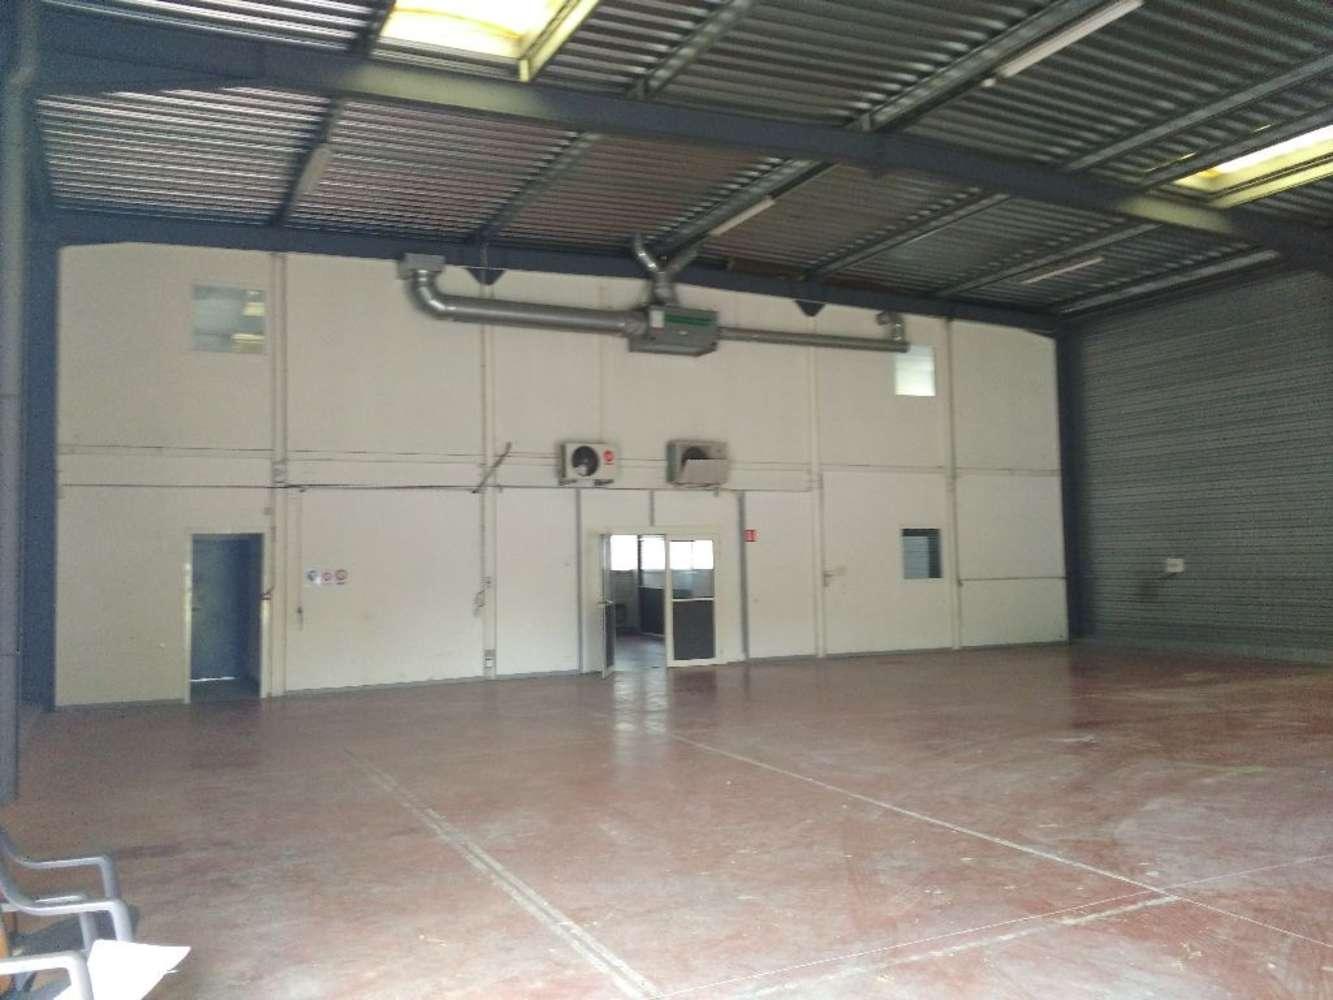 Activités/entrepôt Blyes, 01150 - Achat / Location batiment mixte Lyon Ain - 10035354